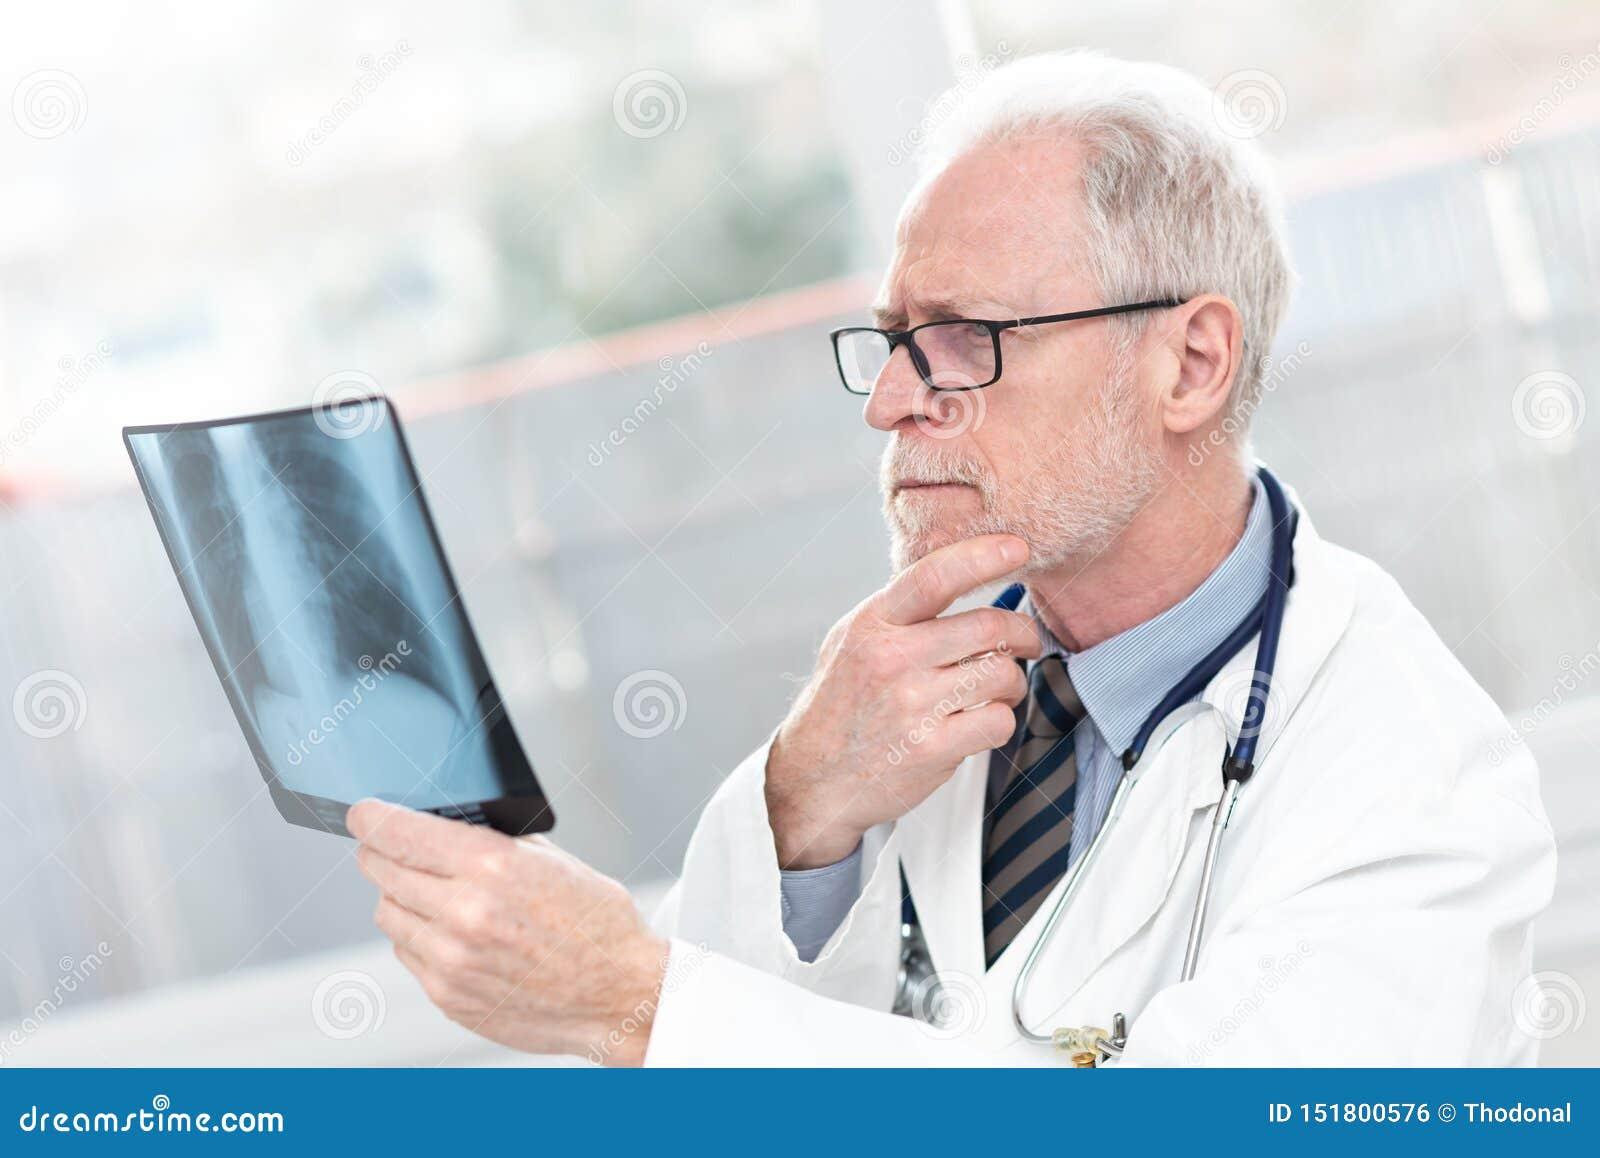 Senior doctor looking at x-ray